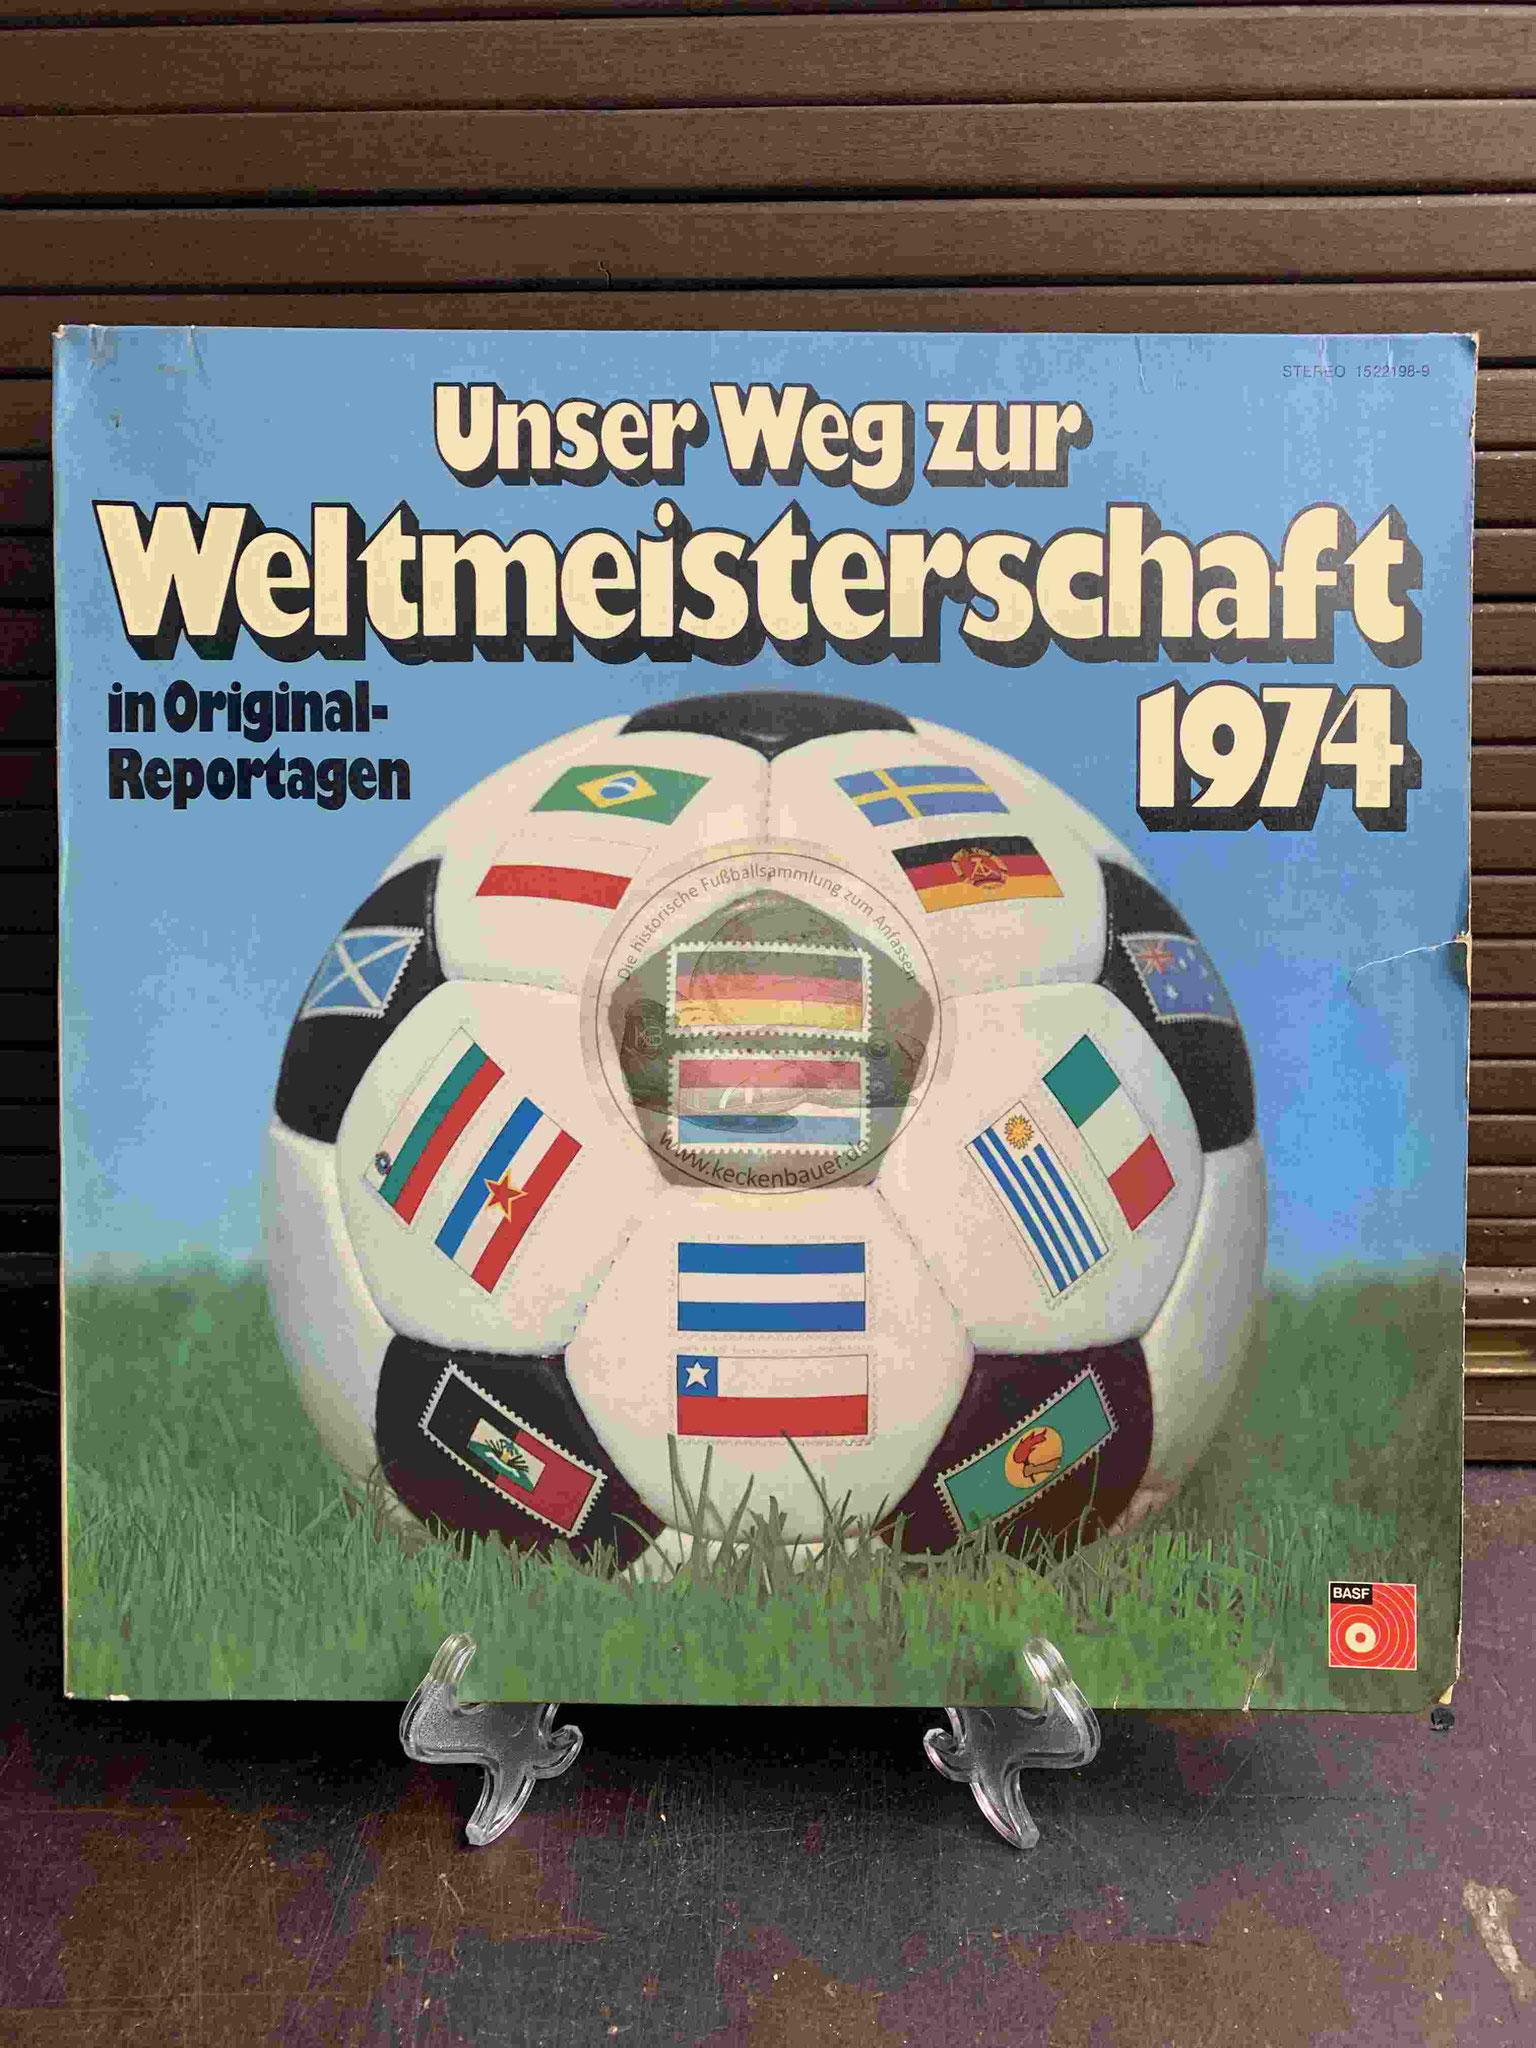 1974 Unser Weg zur Weltmeisterschaft 1974